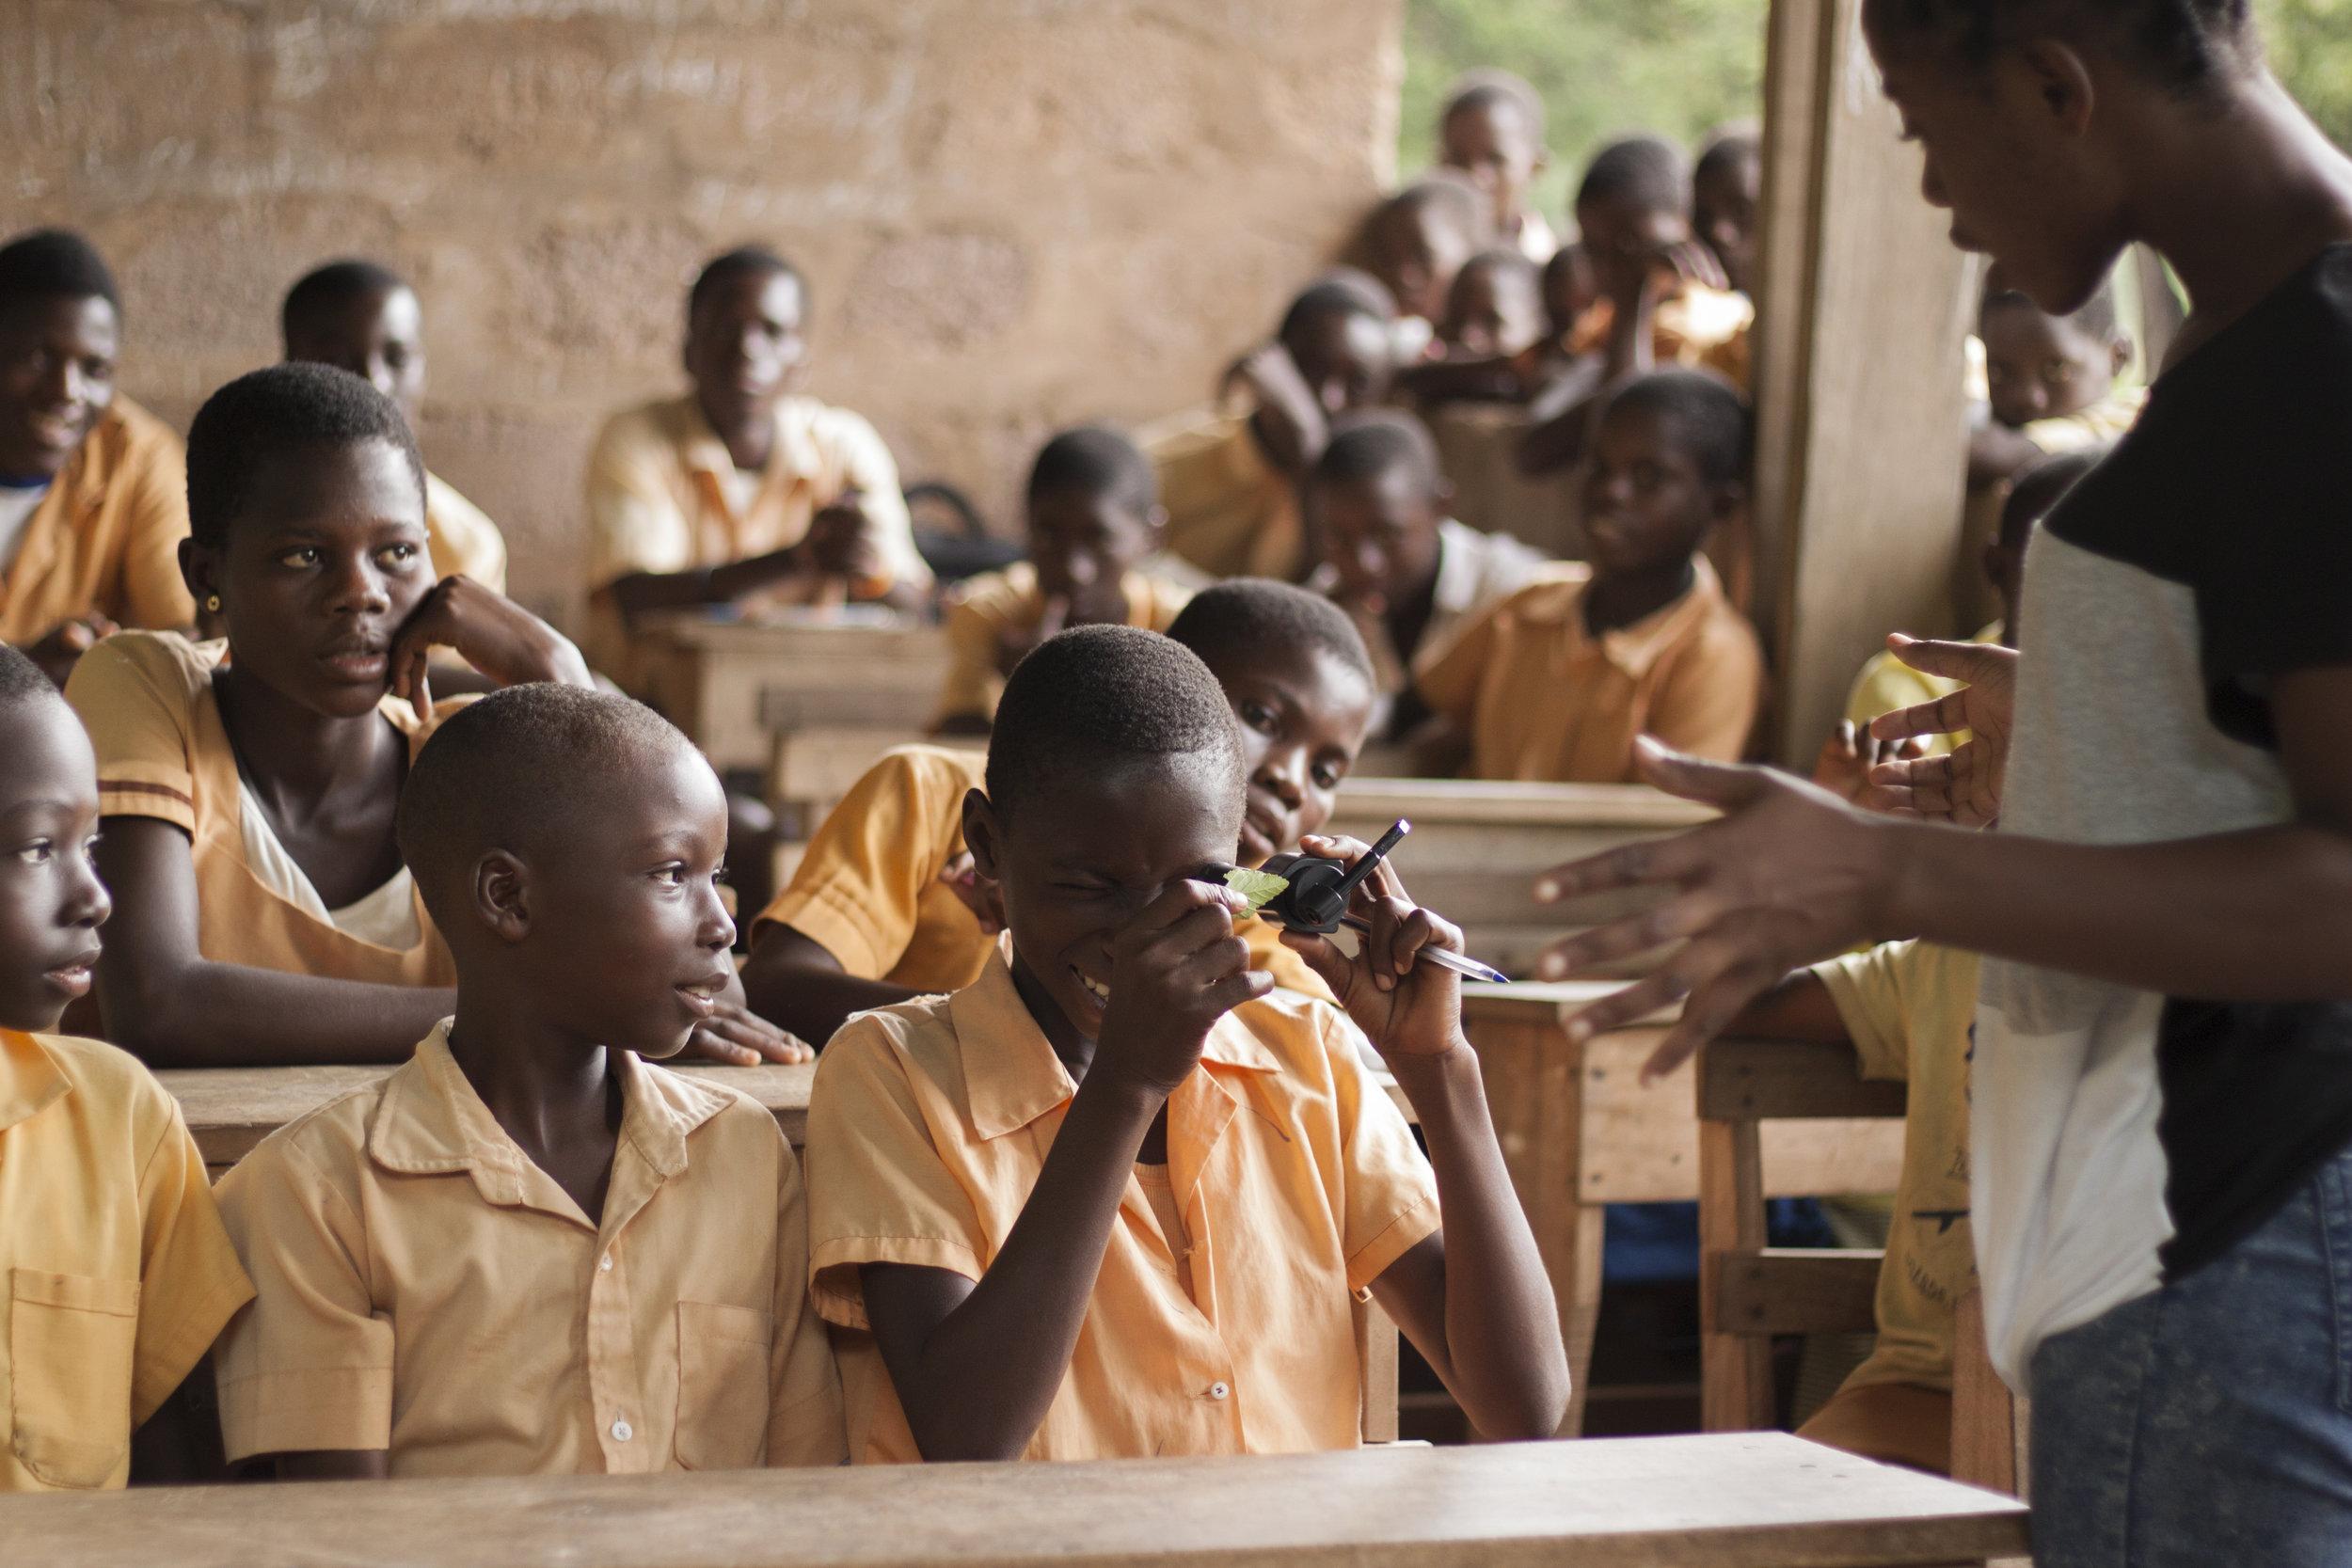 Kpala Government classroom Science kits 5.jpg